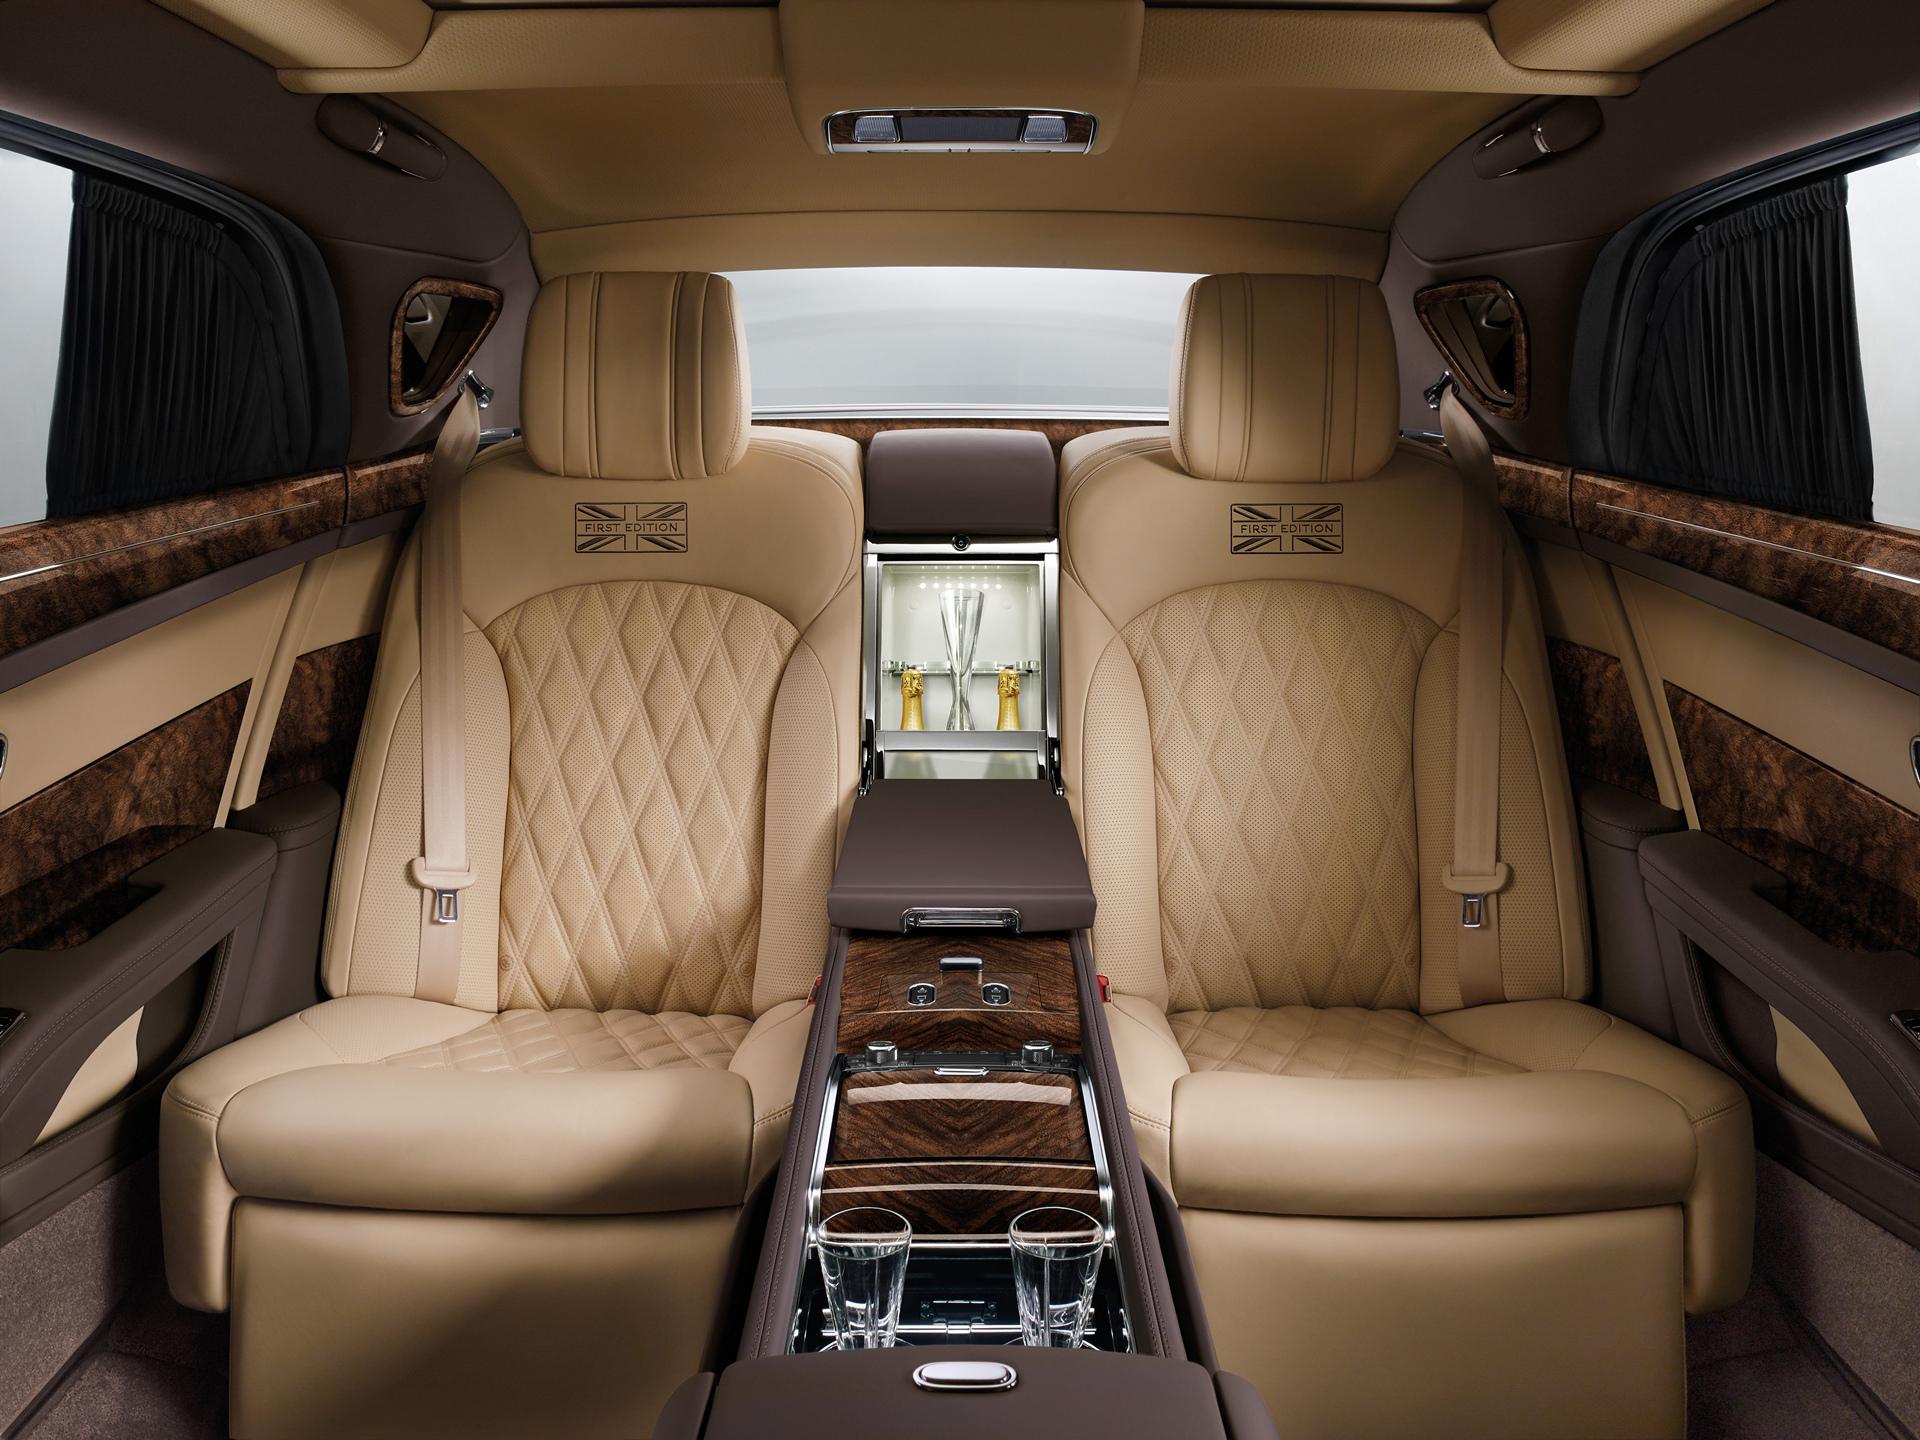 bentley at the beijing auto show 2016 carrrs auto portal. Black Bedroom Furniture Sets. Home Design Ideas